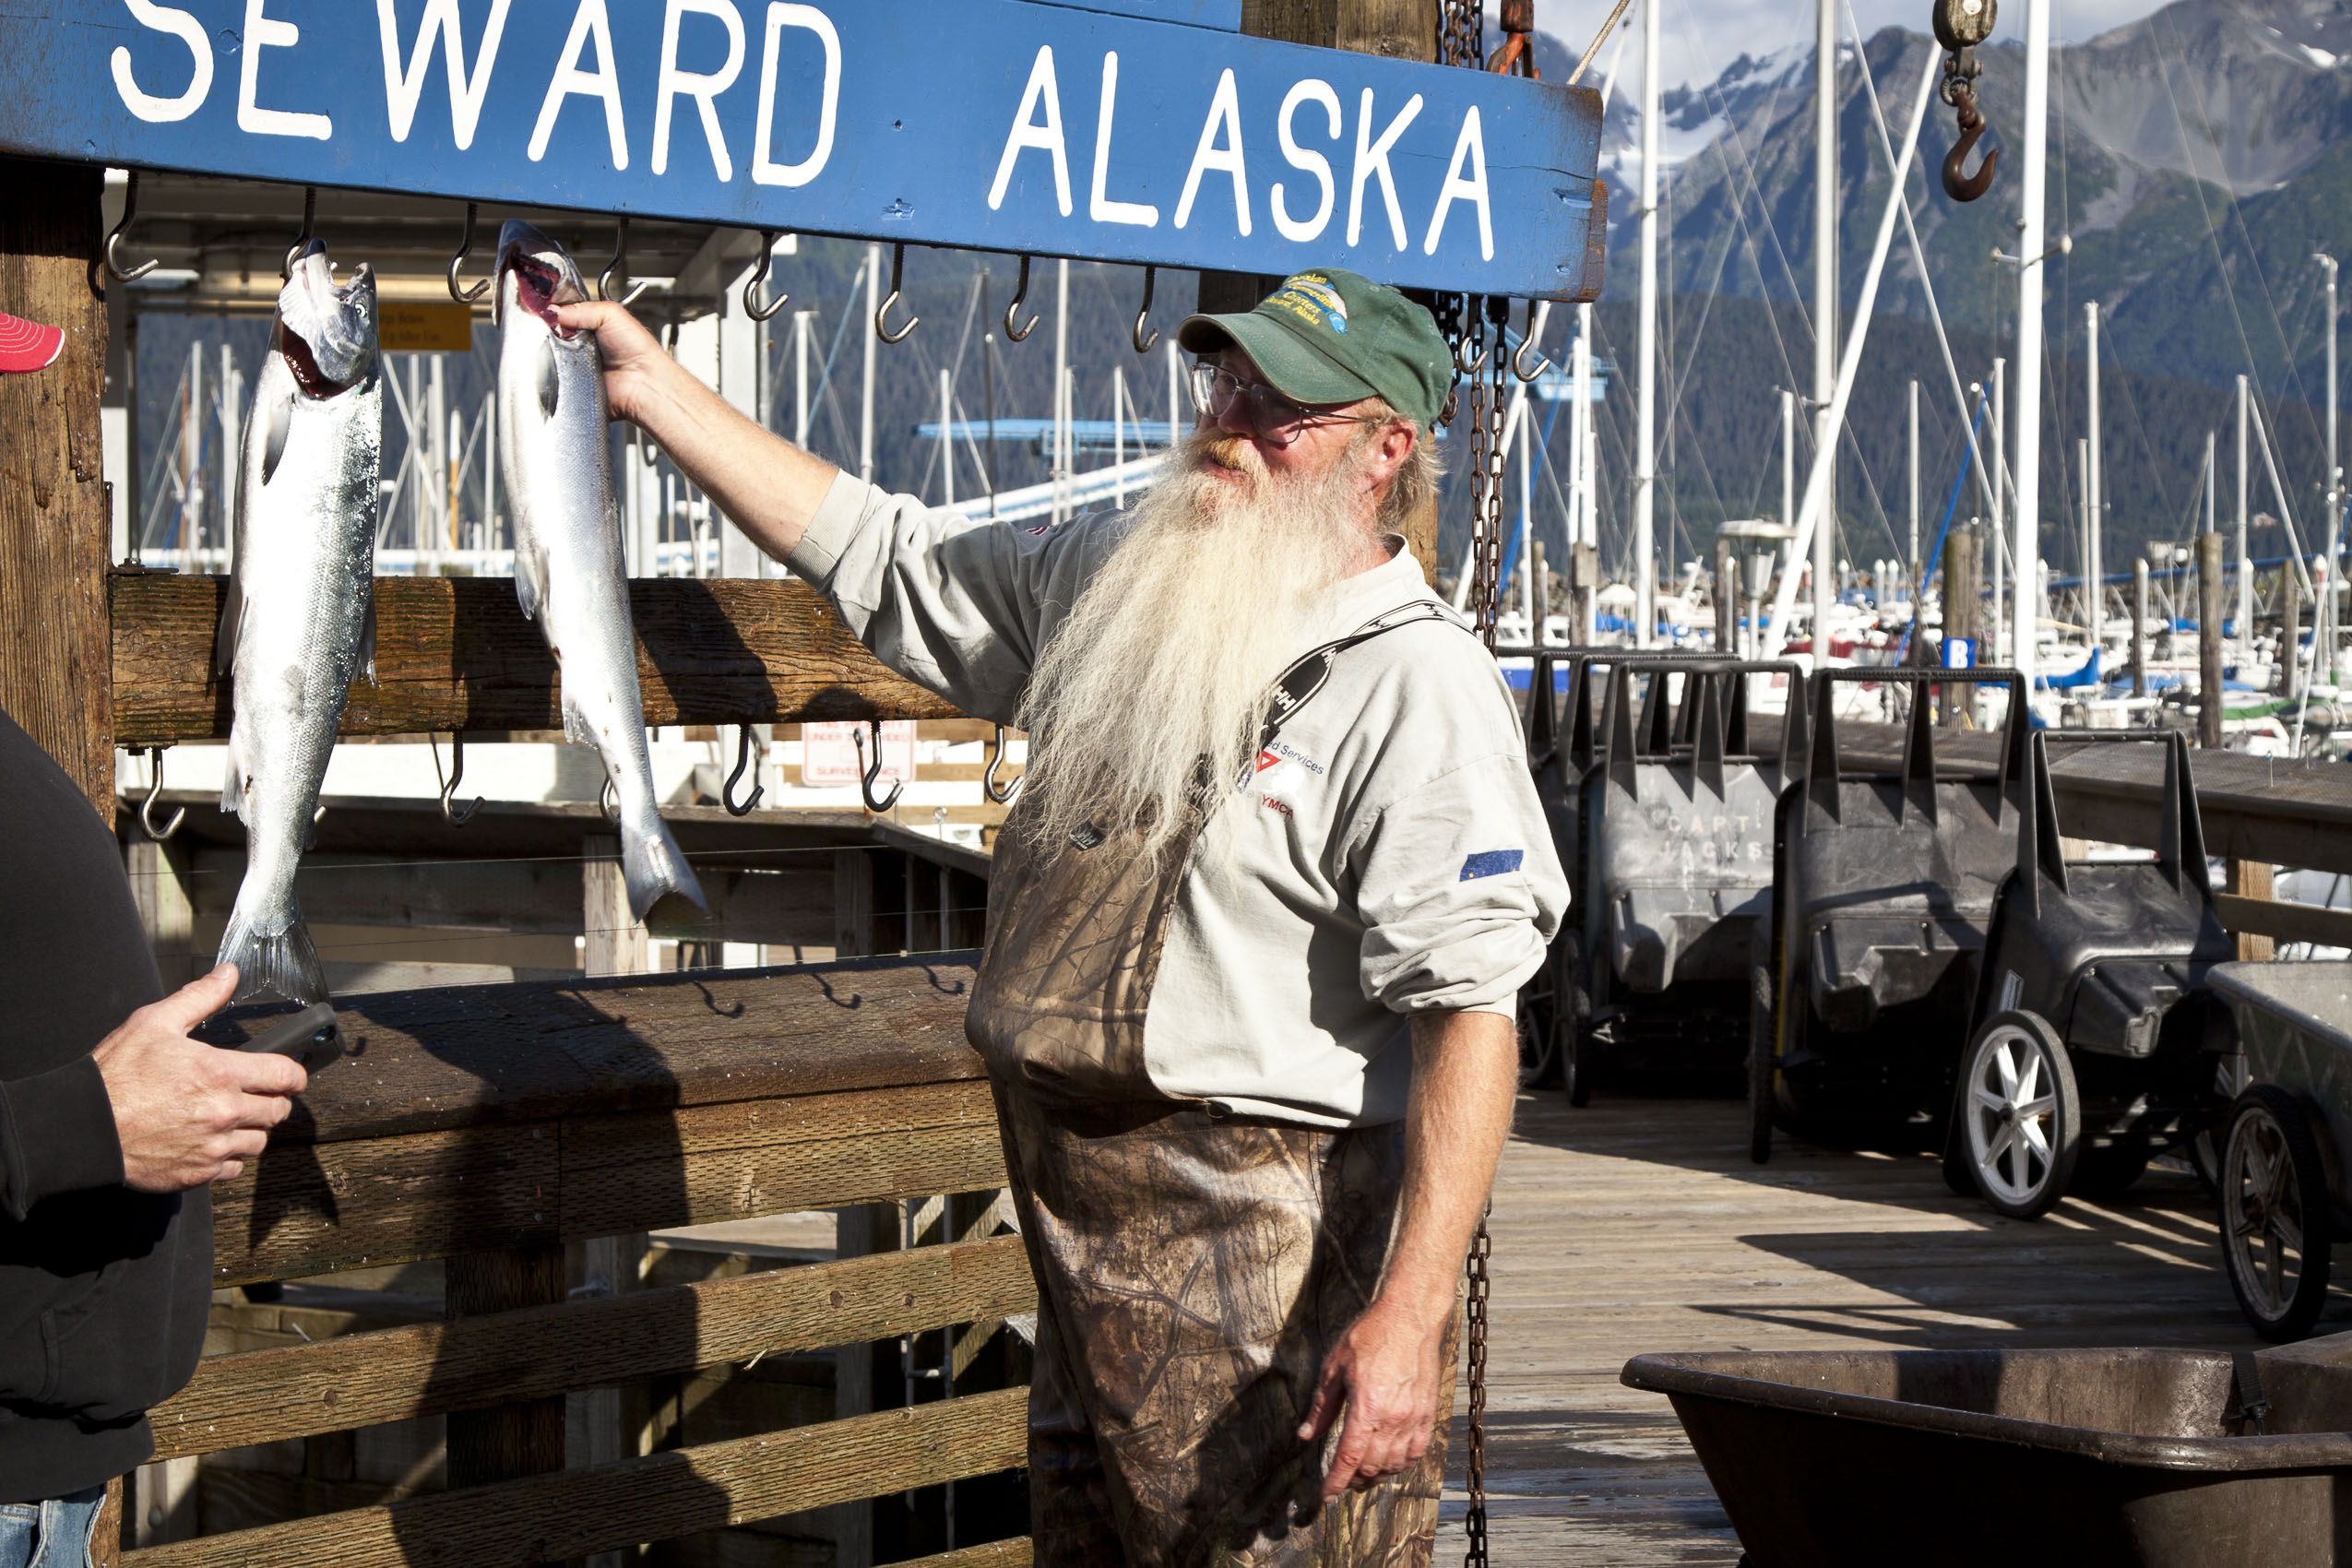 alaska_valdez_fisherman.jpg